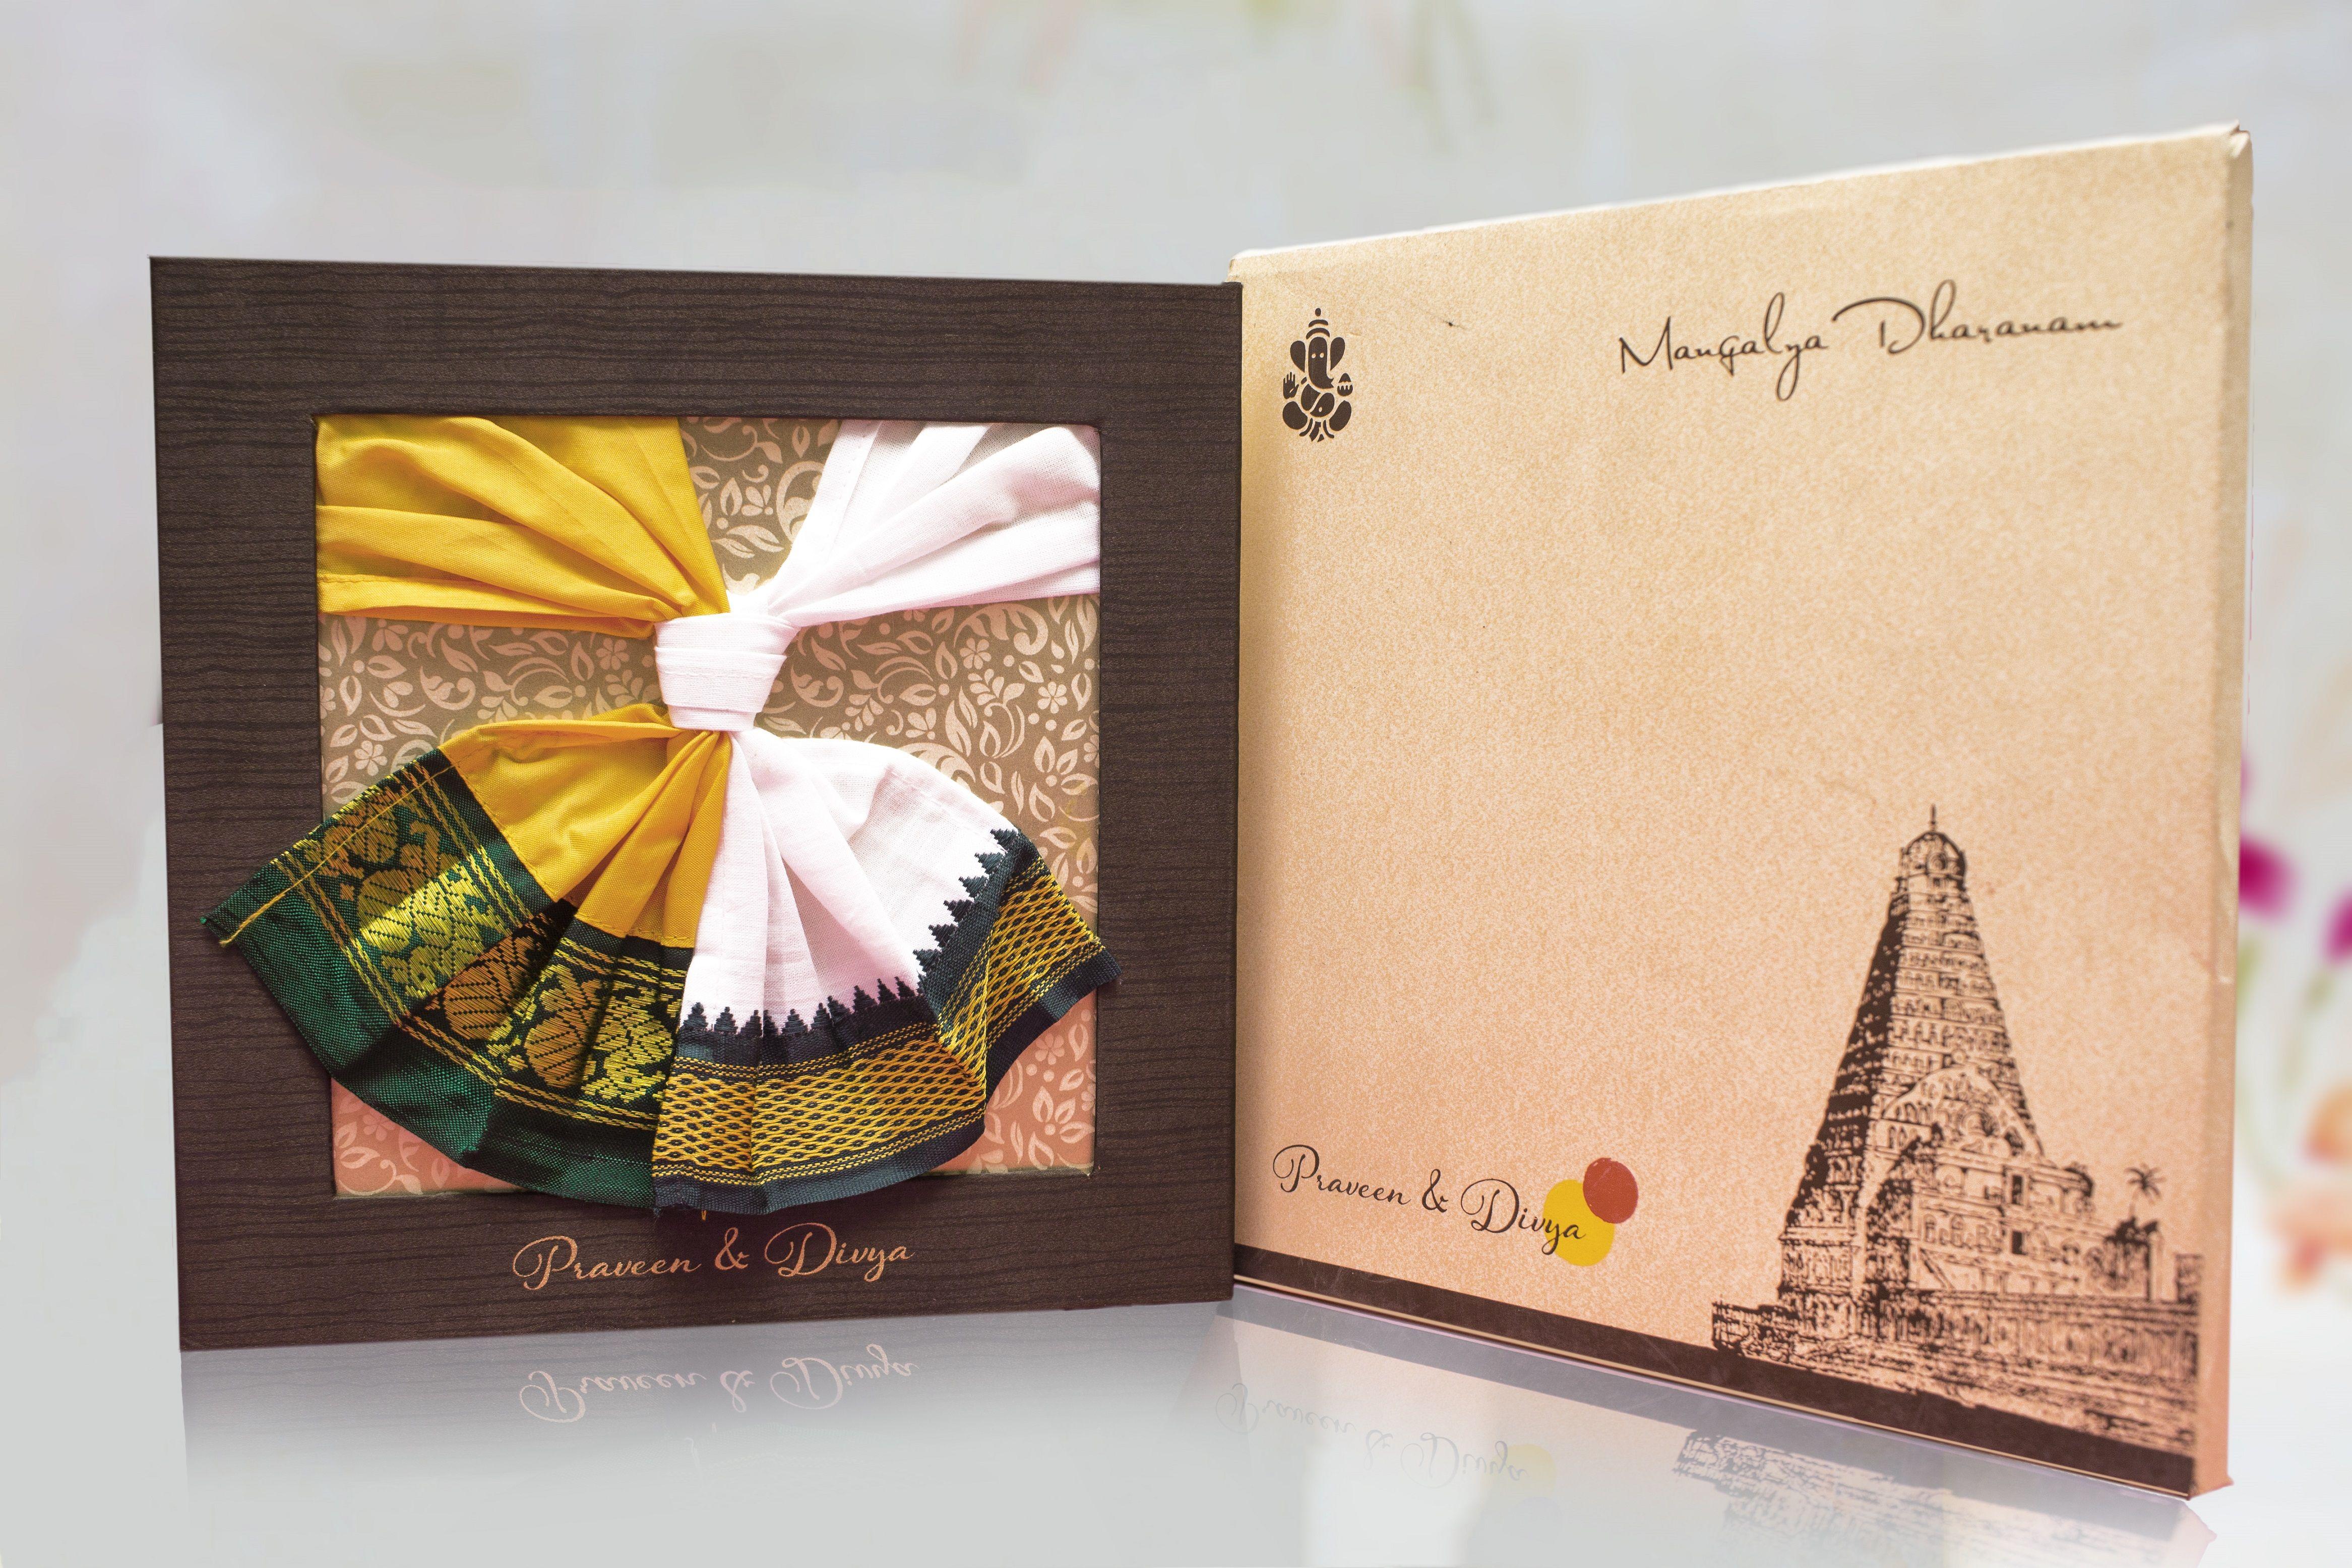 Indian Creative Hindu Wedding Invitation Which Brings The